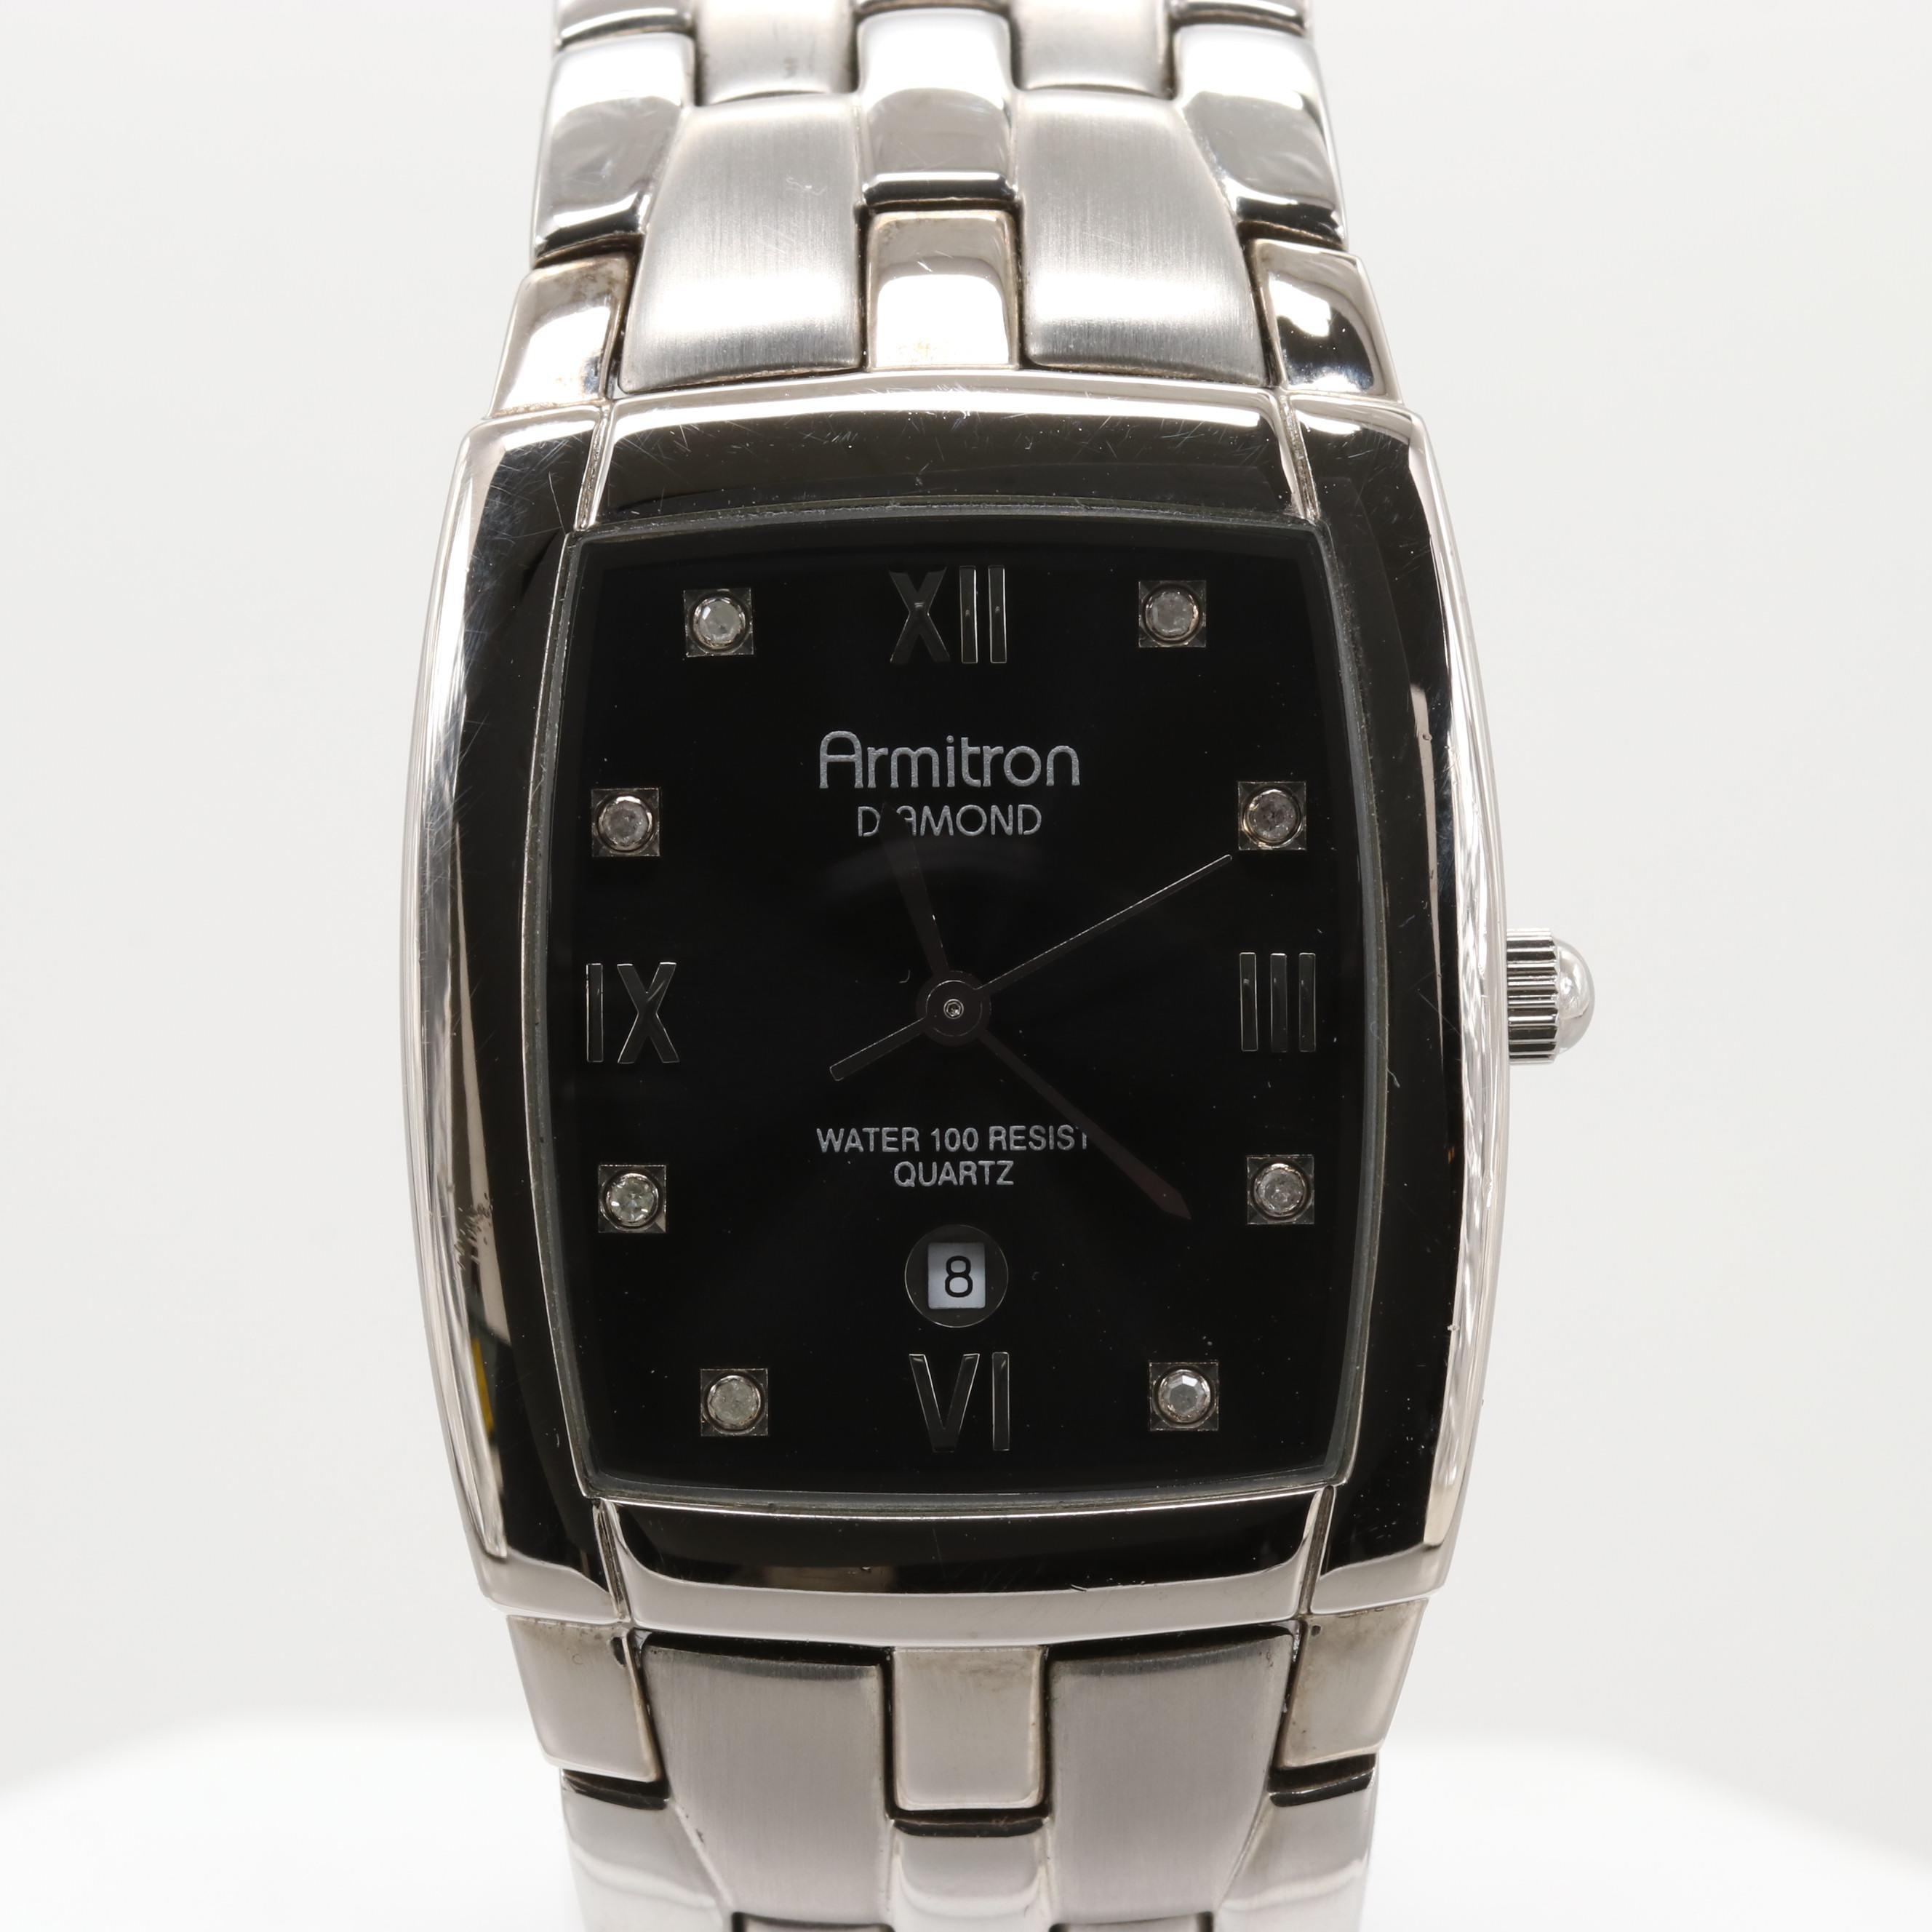 Armitron Stainless Steel Quartz Wristwatch With Diamond Dial